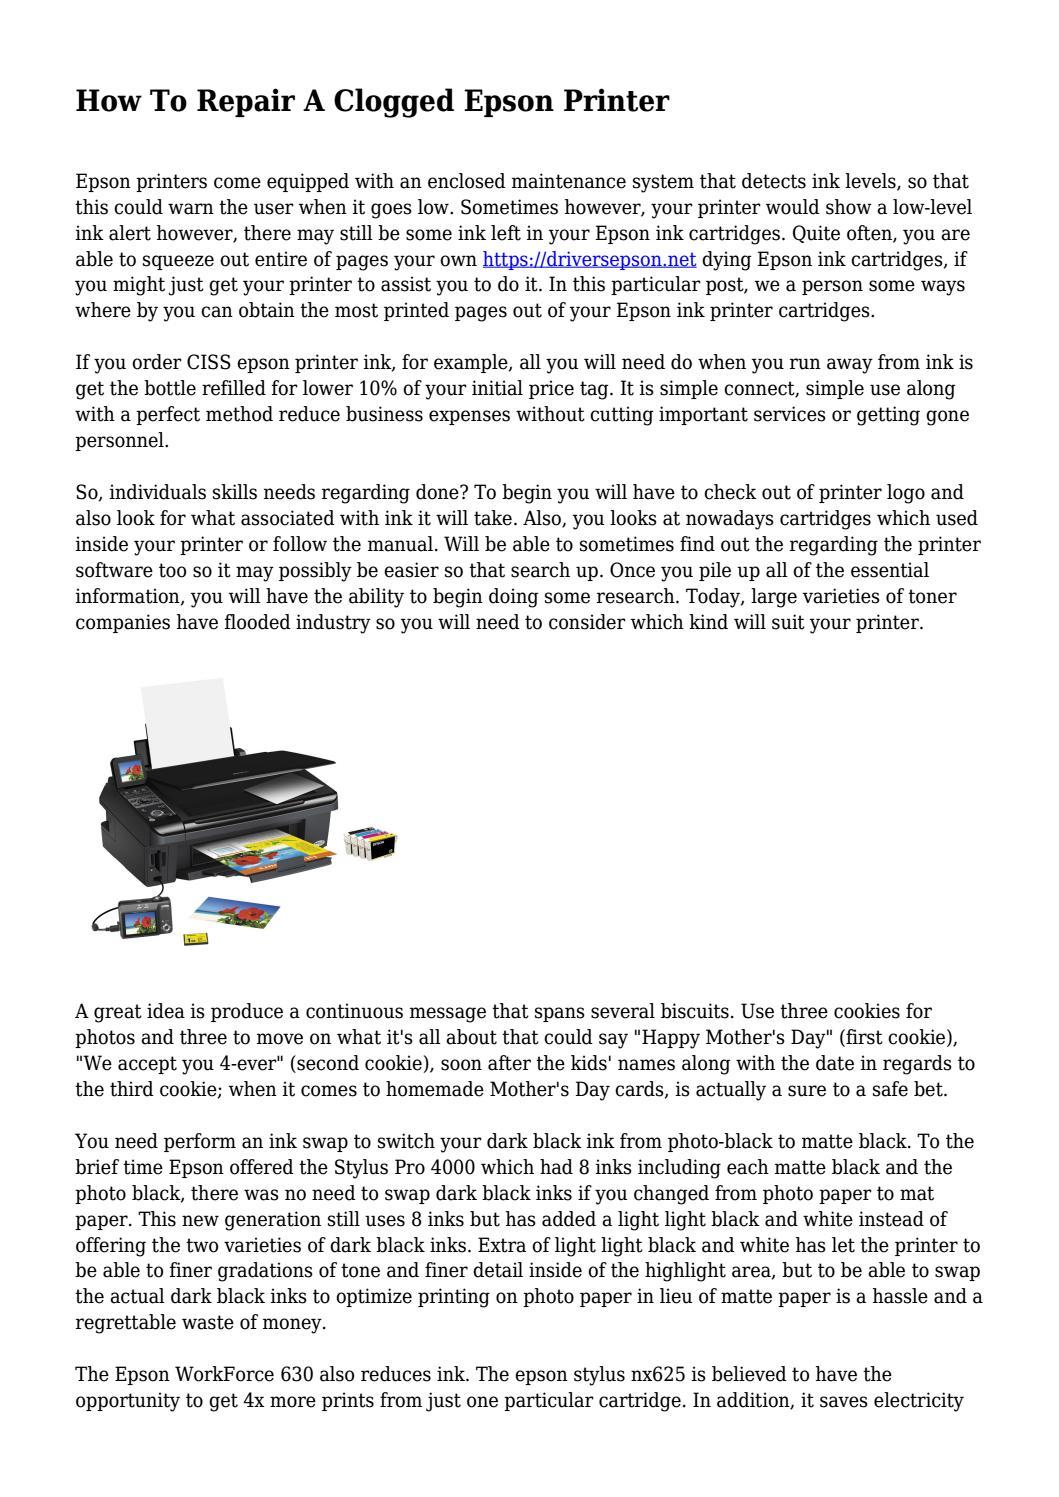 How To Repair A Clogged Epson Printer by docmagazinehub - issuu